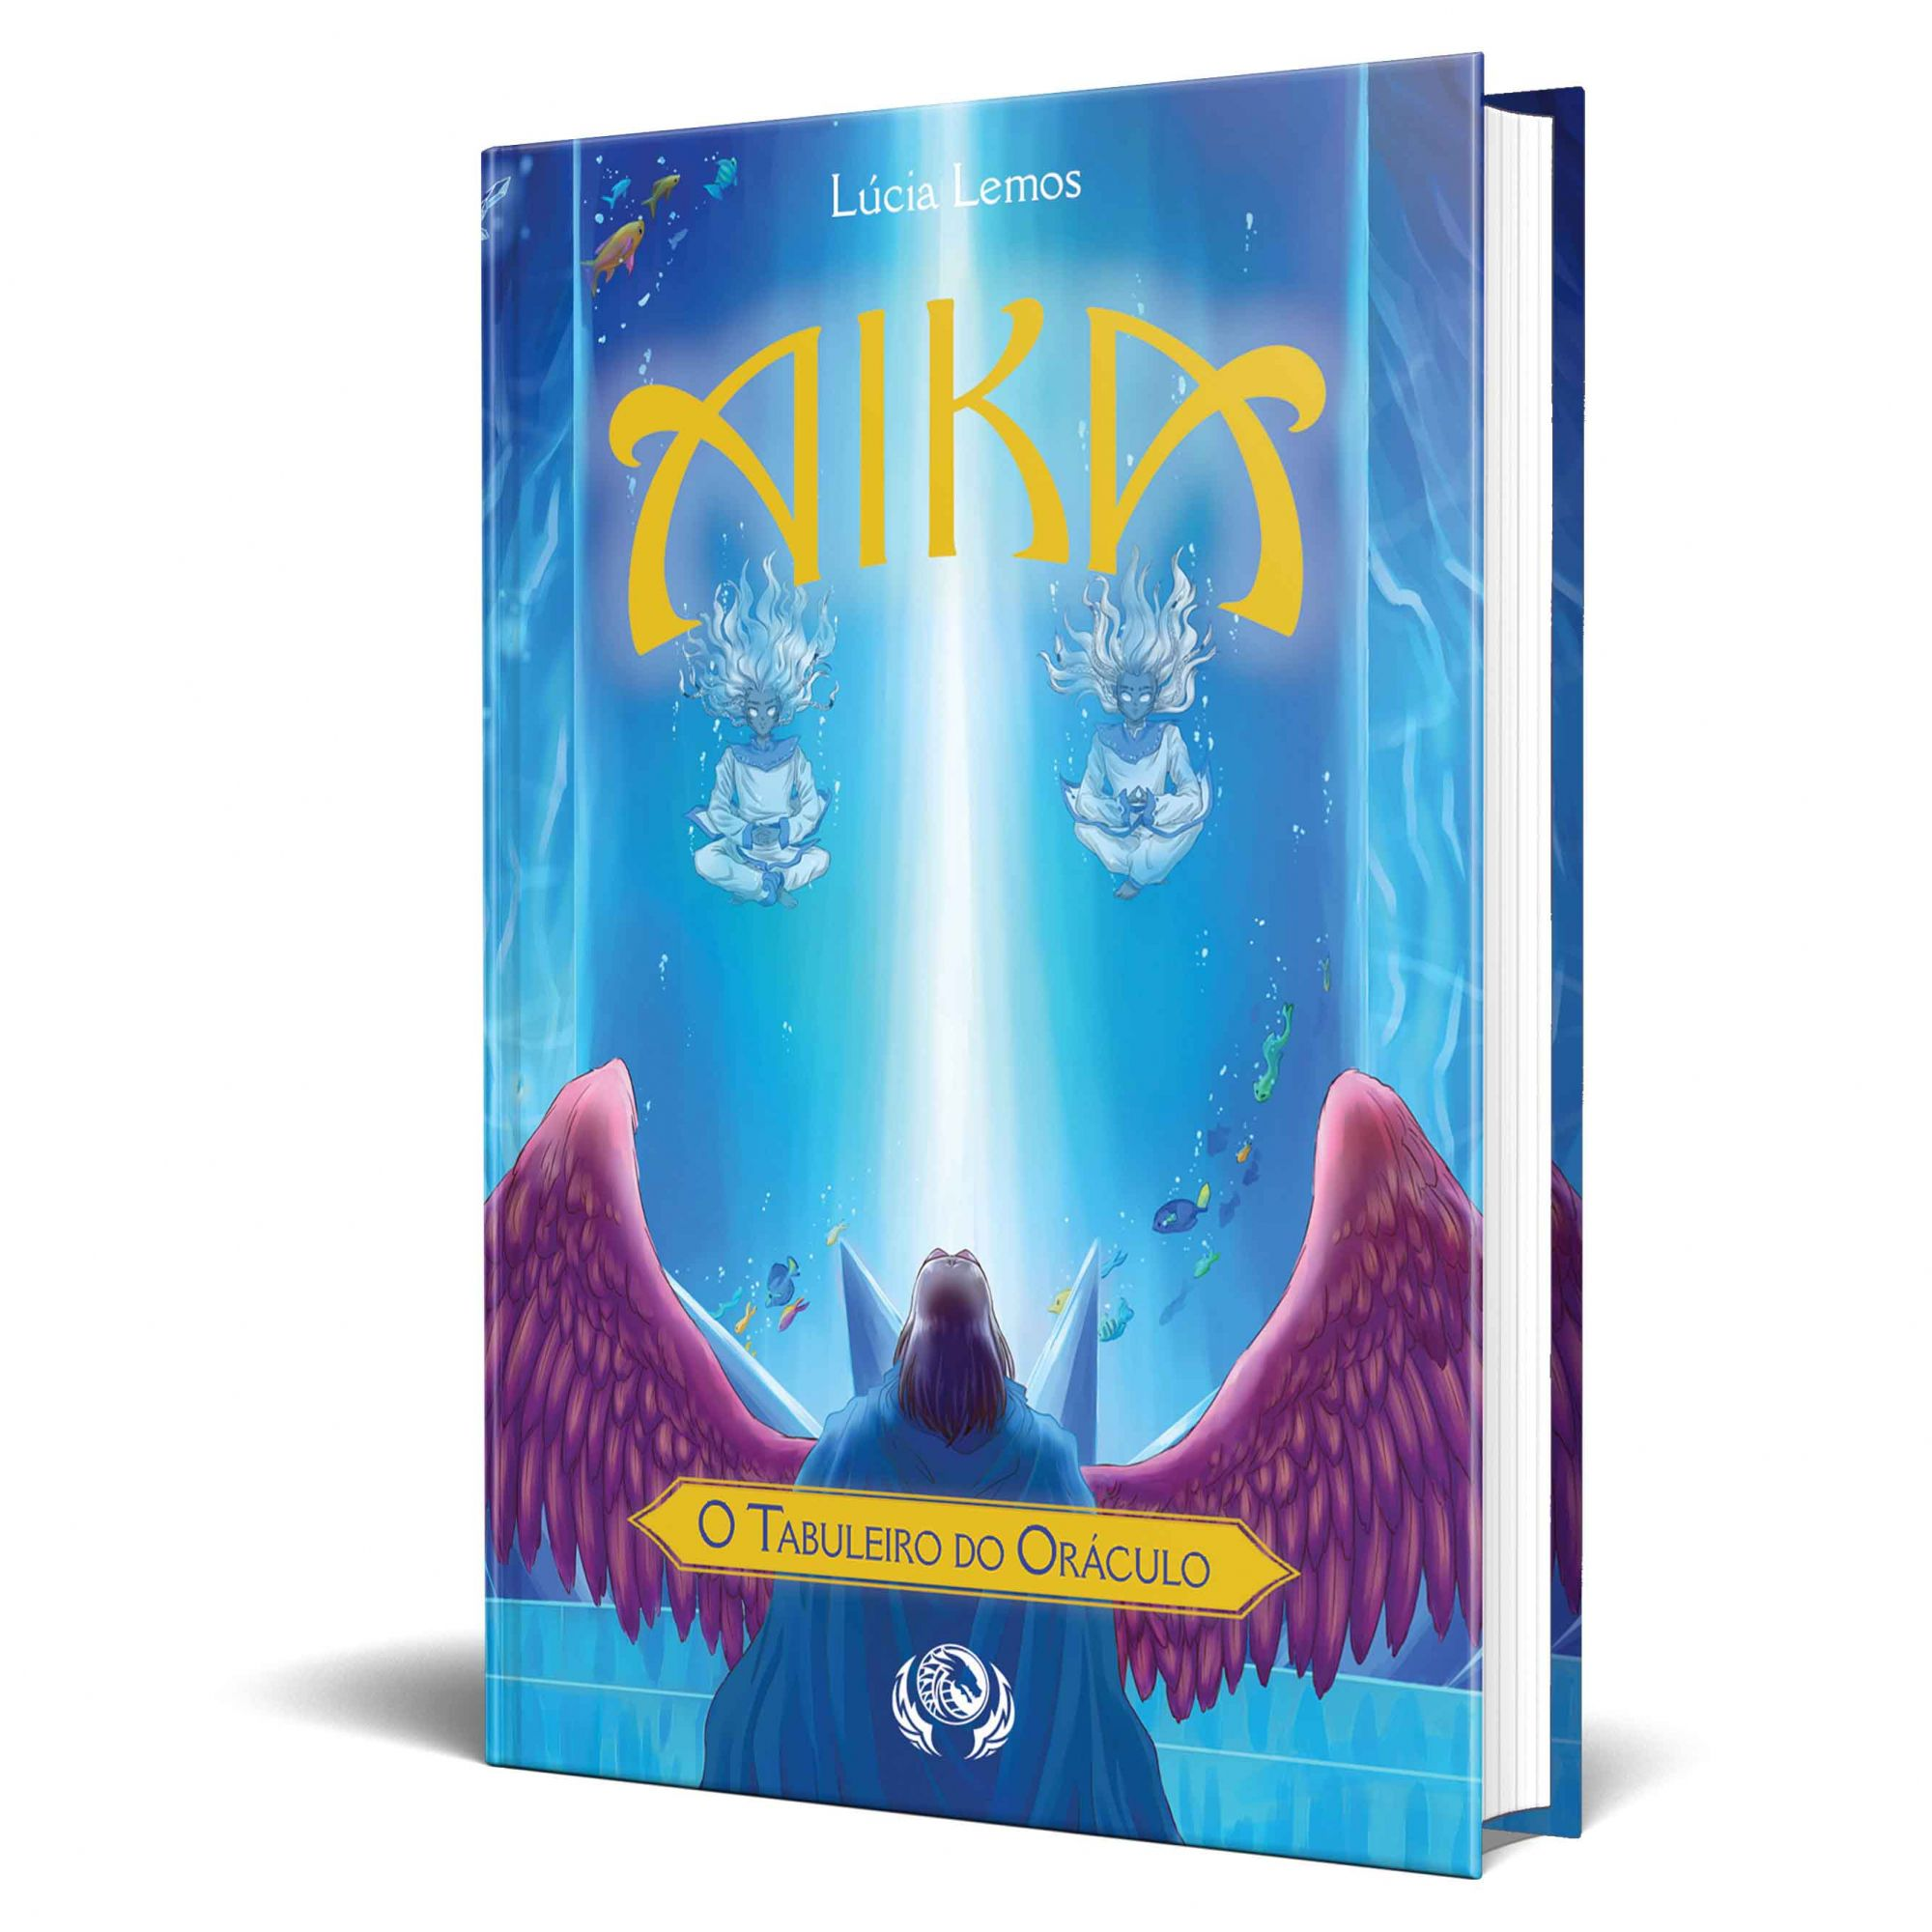 *** Pré-Venda *** do livro Aika - O Tabuleiro do Oráculo